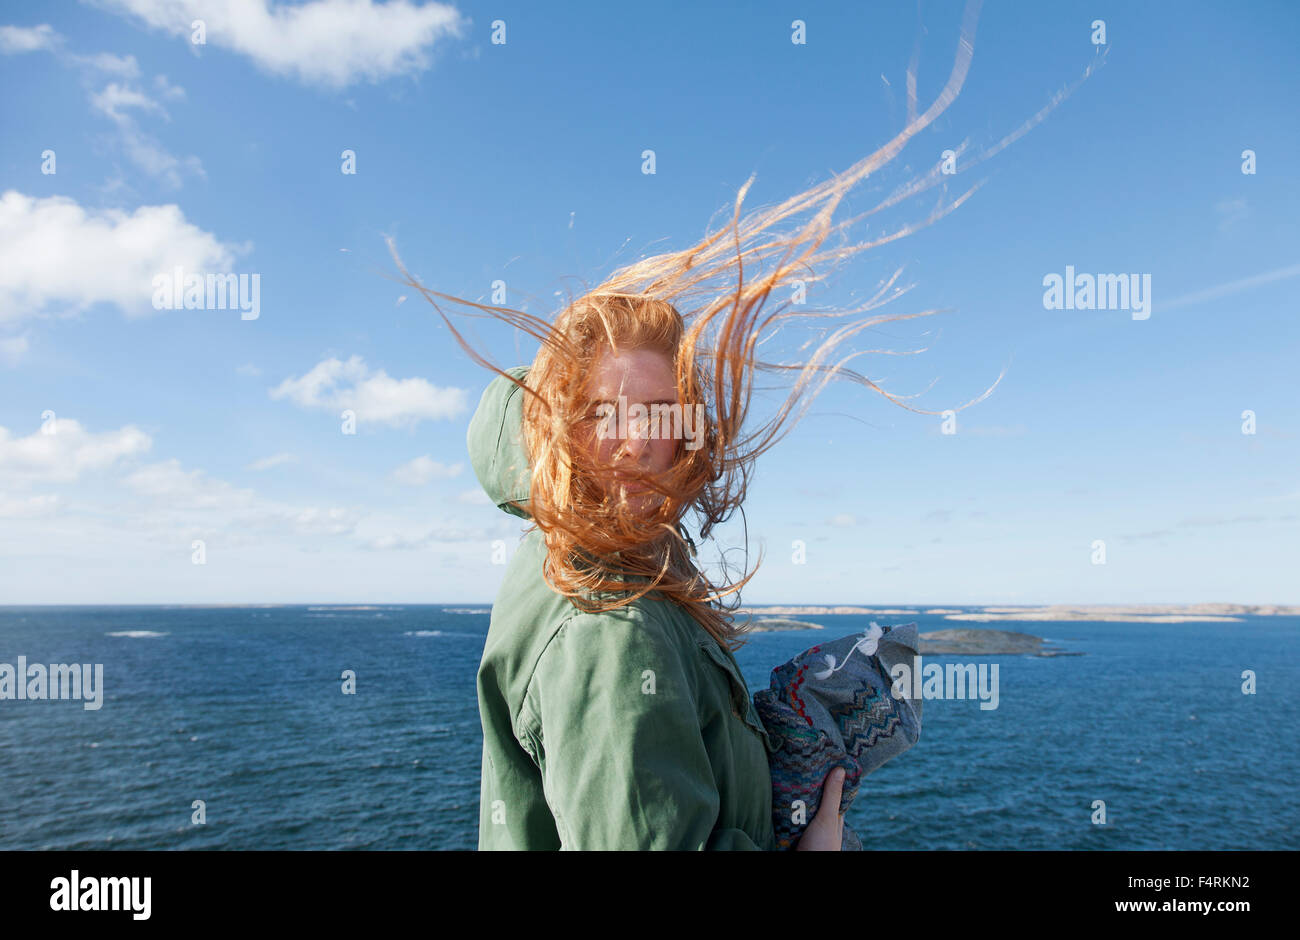 Sweden, Swedish West Coast, Bohuslan, Skaftolandet, Young woman standing at seaside - Stock Image